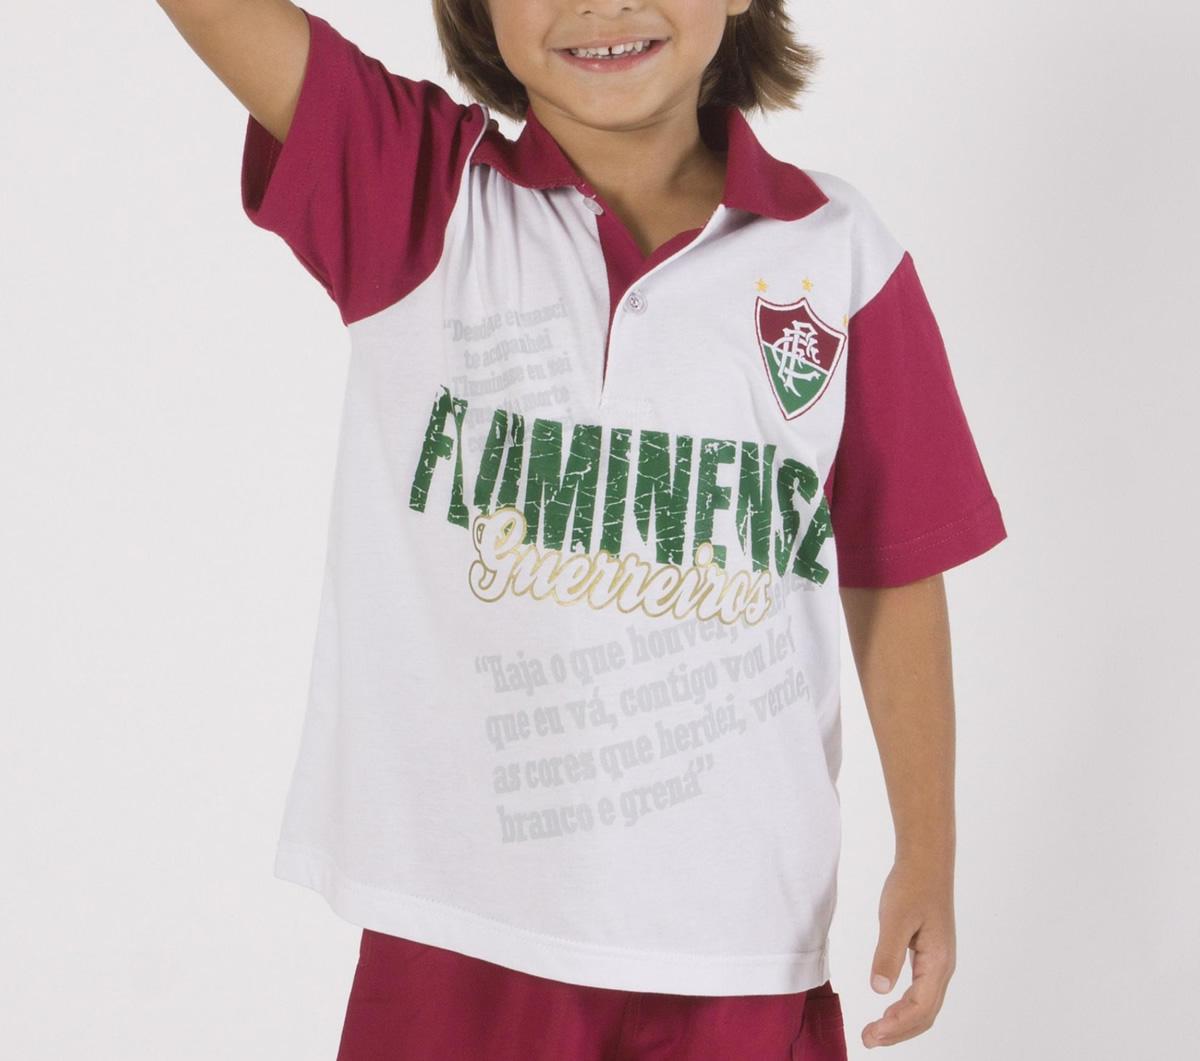 37b31cfccaebd Camisa Fluminense Polo Team Infantil Camisa Fluminense Polo Team Infantil